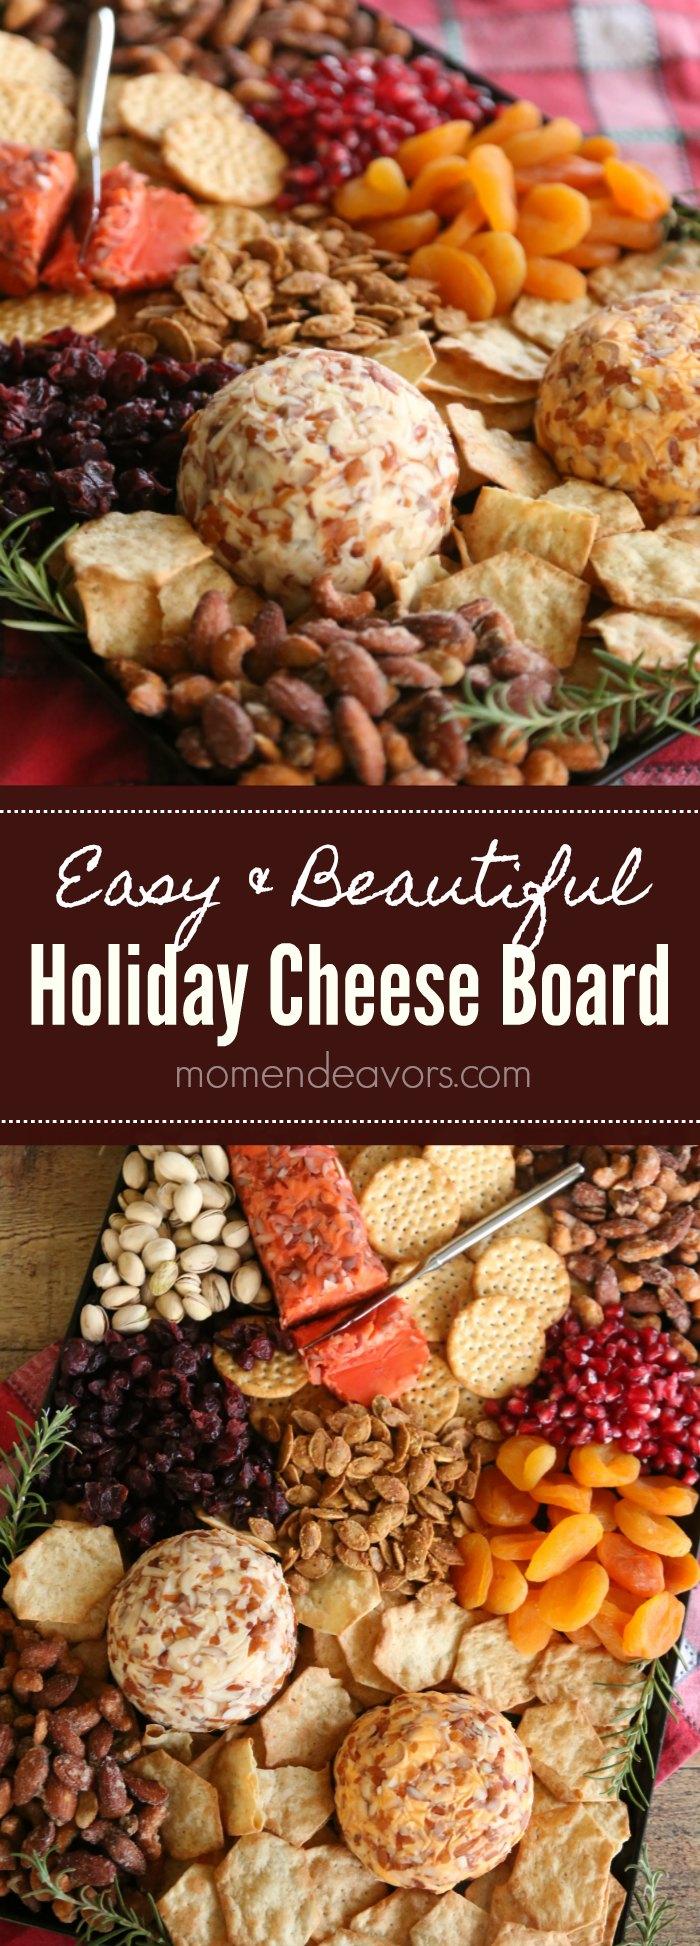 Easy & Beautiful Holiday Cheese Board